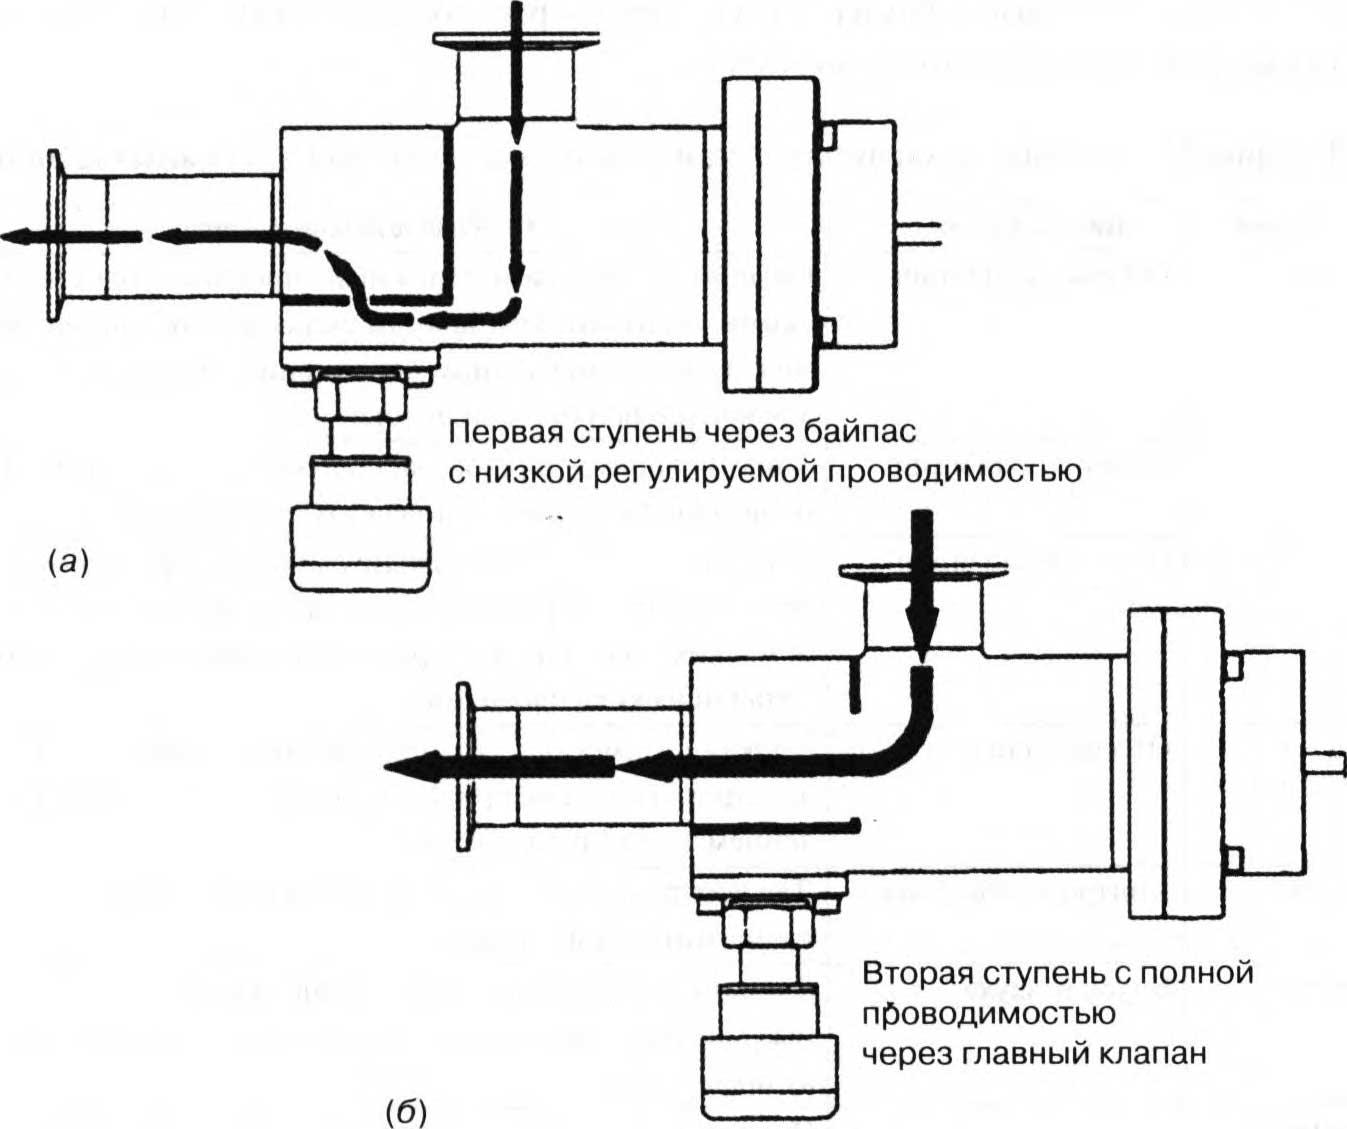 тарельчатый клапан с байпасом для мягкого запуска